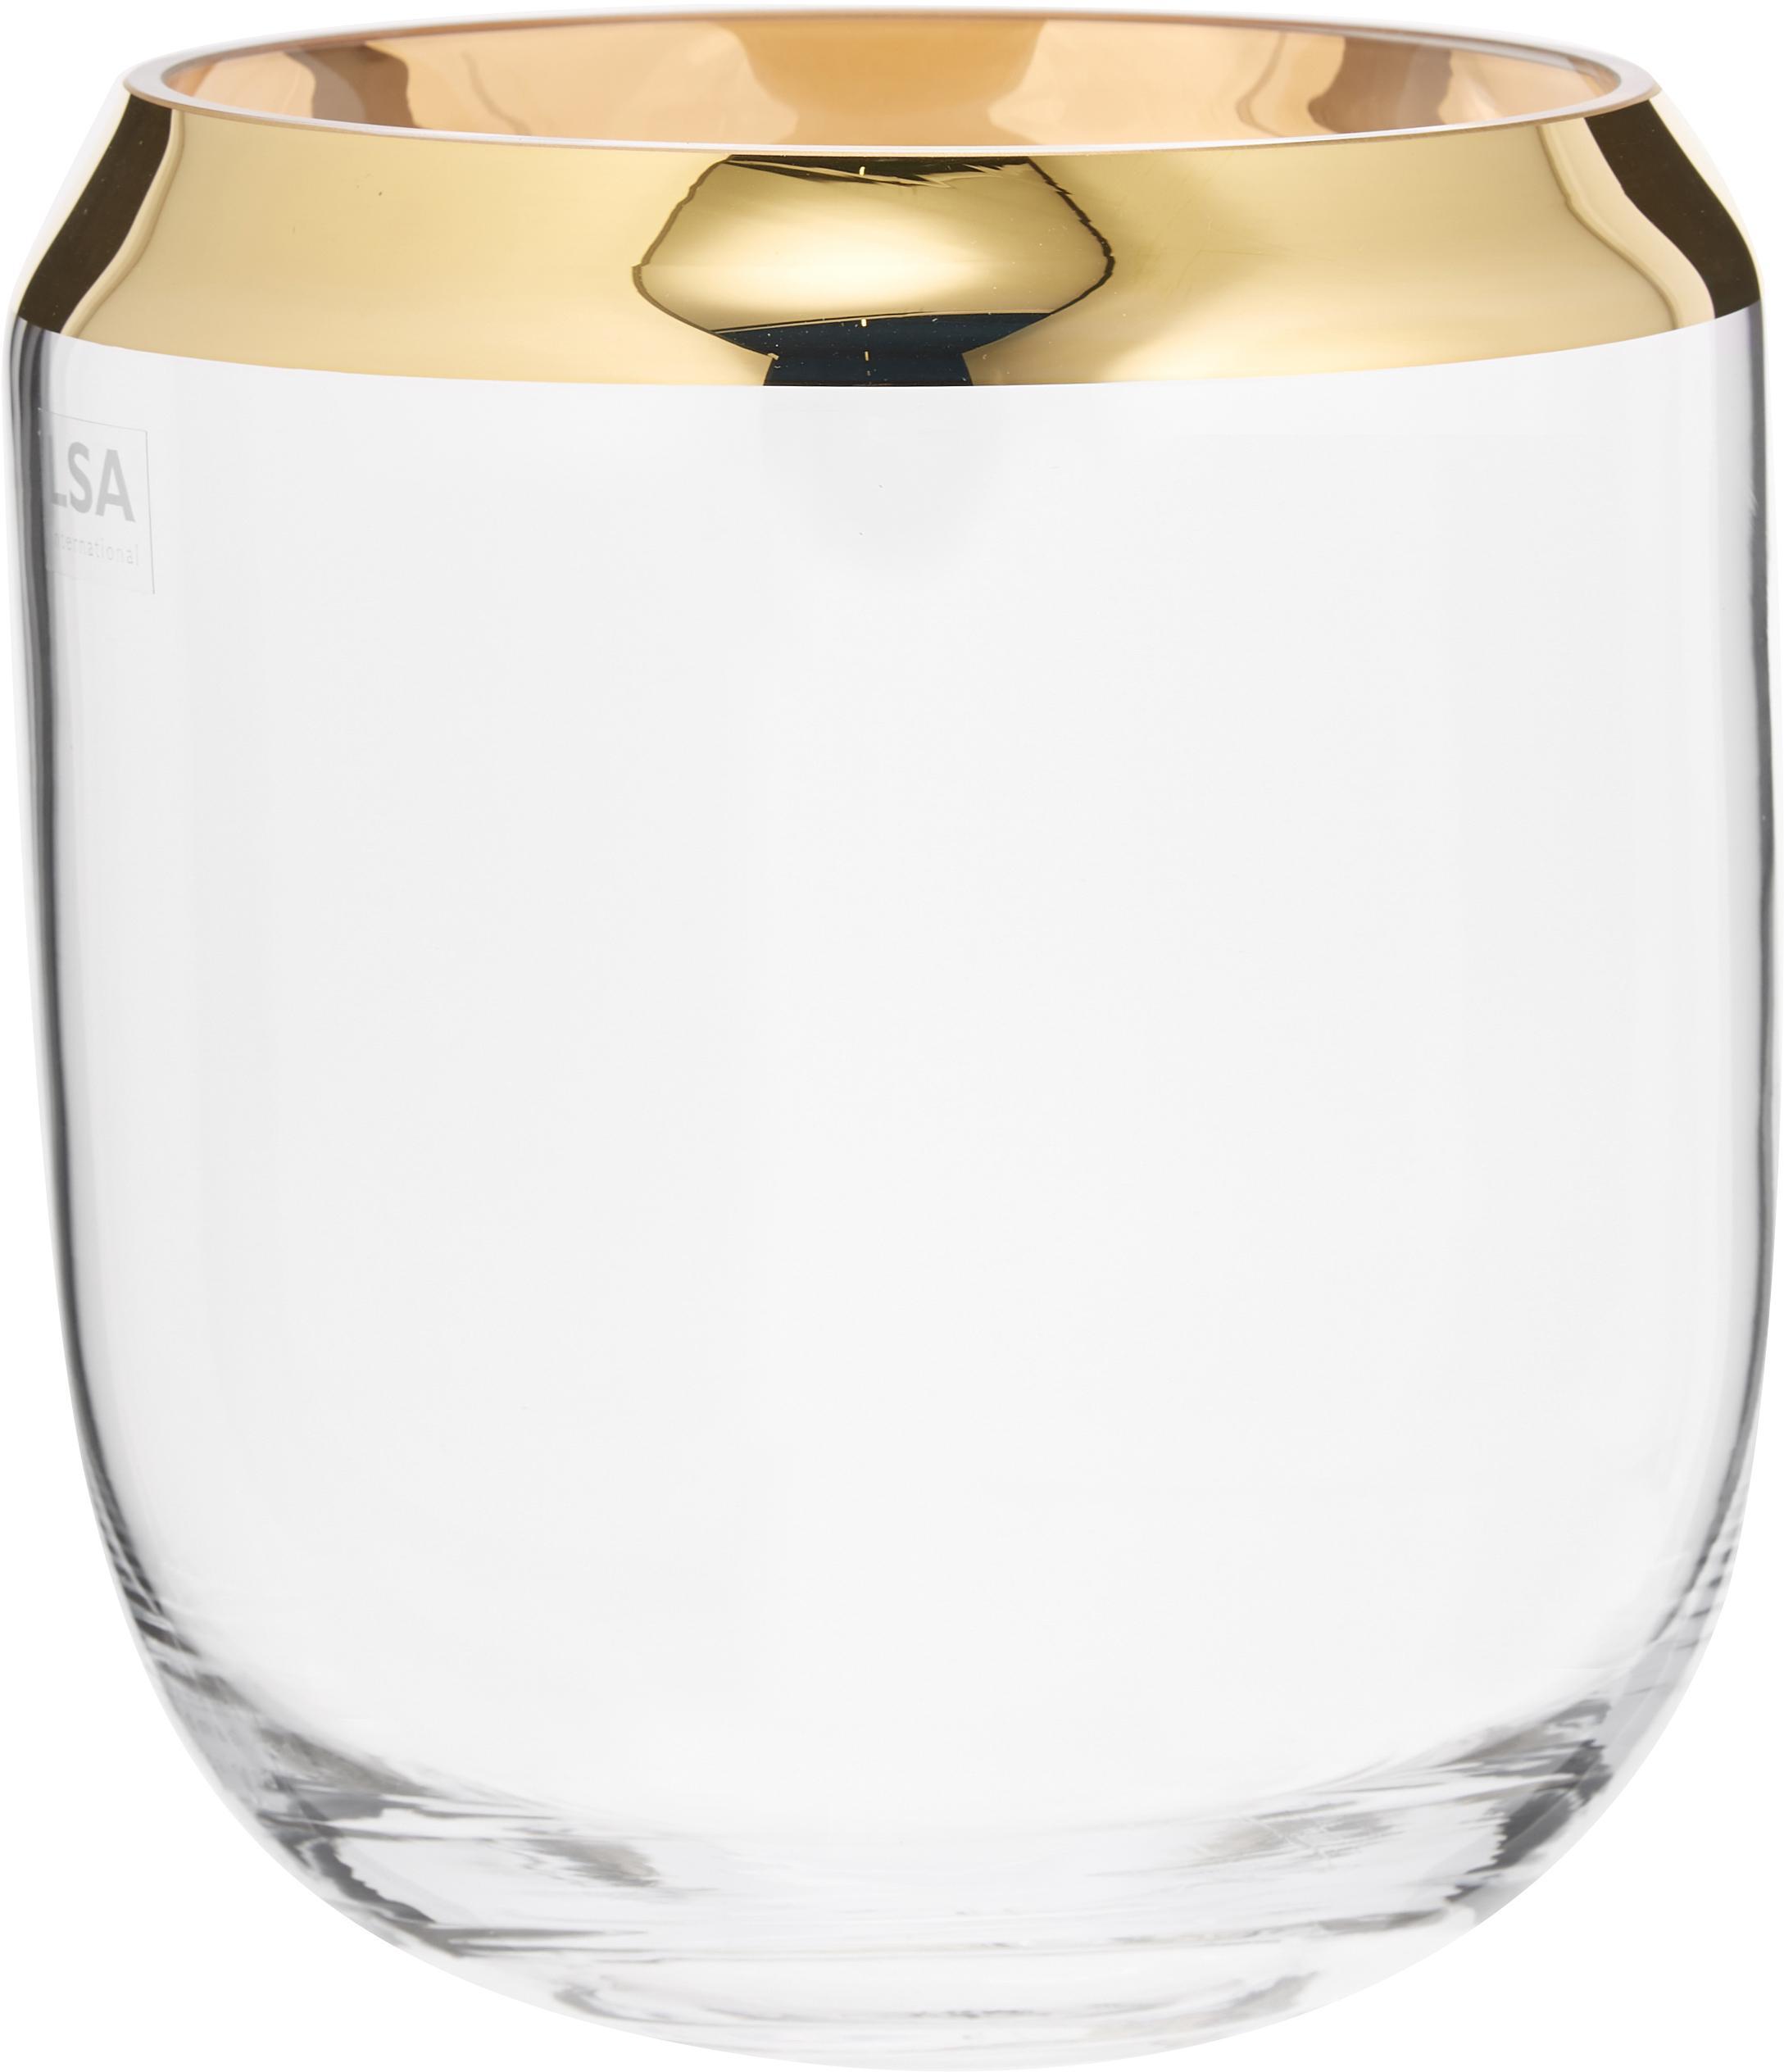 Mondgeblazen vaas Space, Glas, Transparant, goudkleurig, Ø 18 x H 20 cm